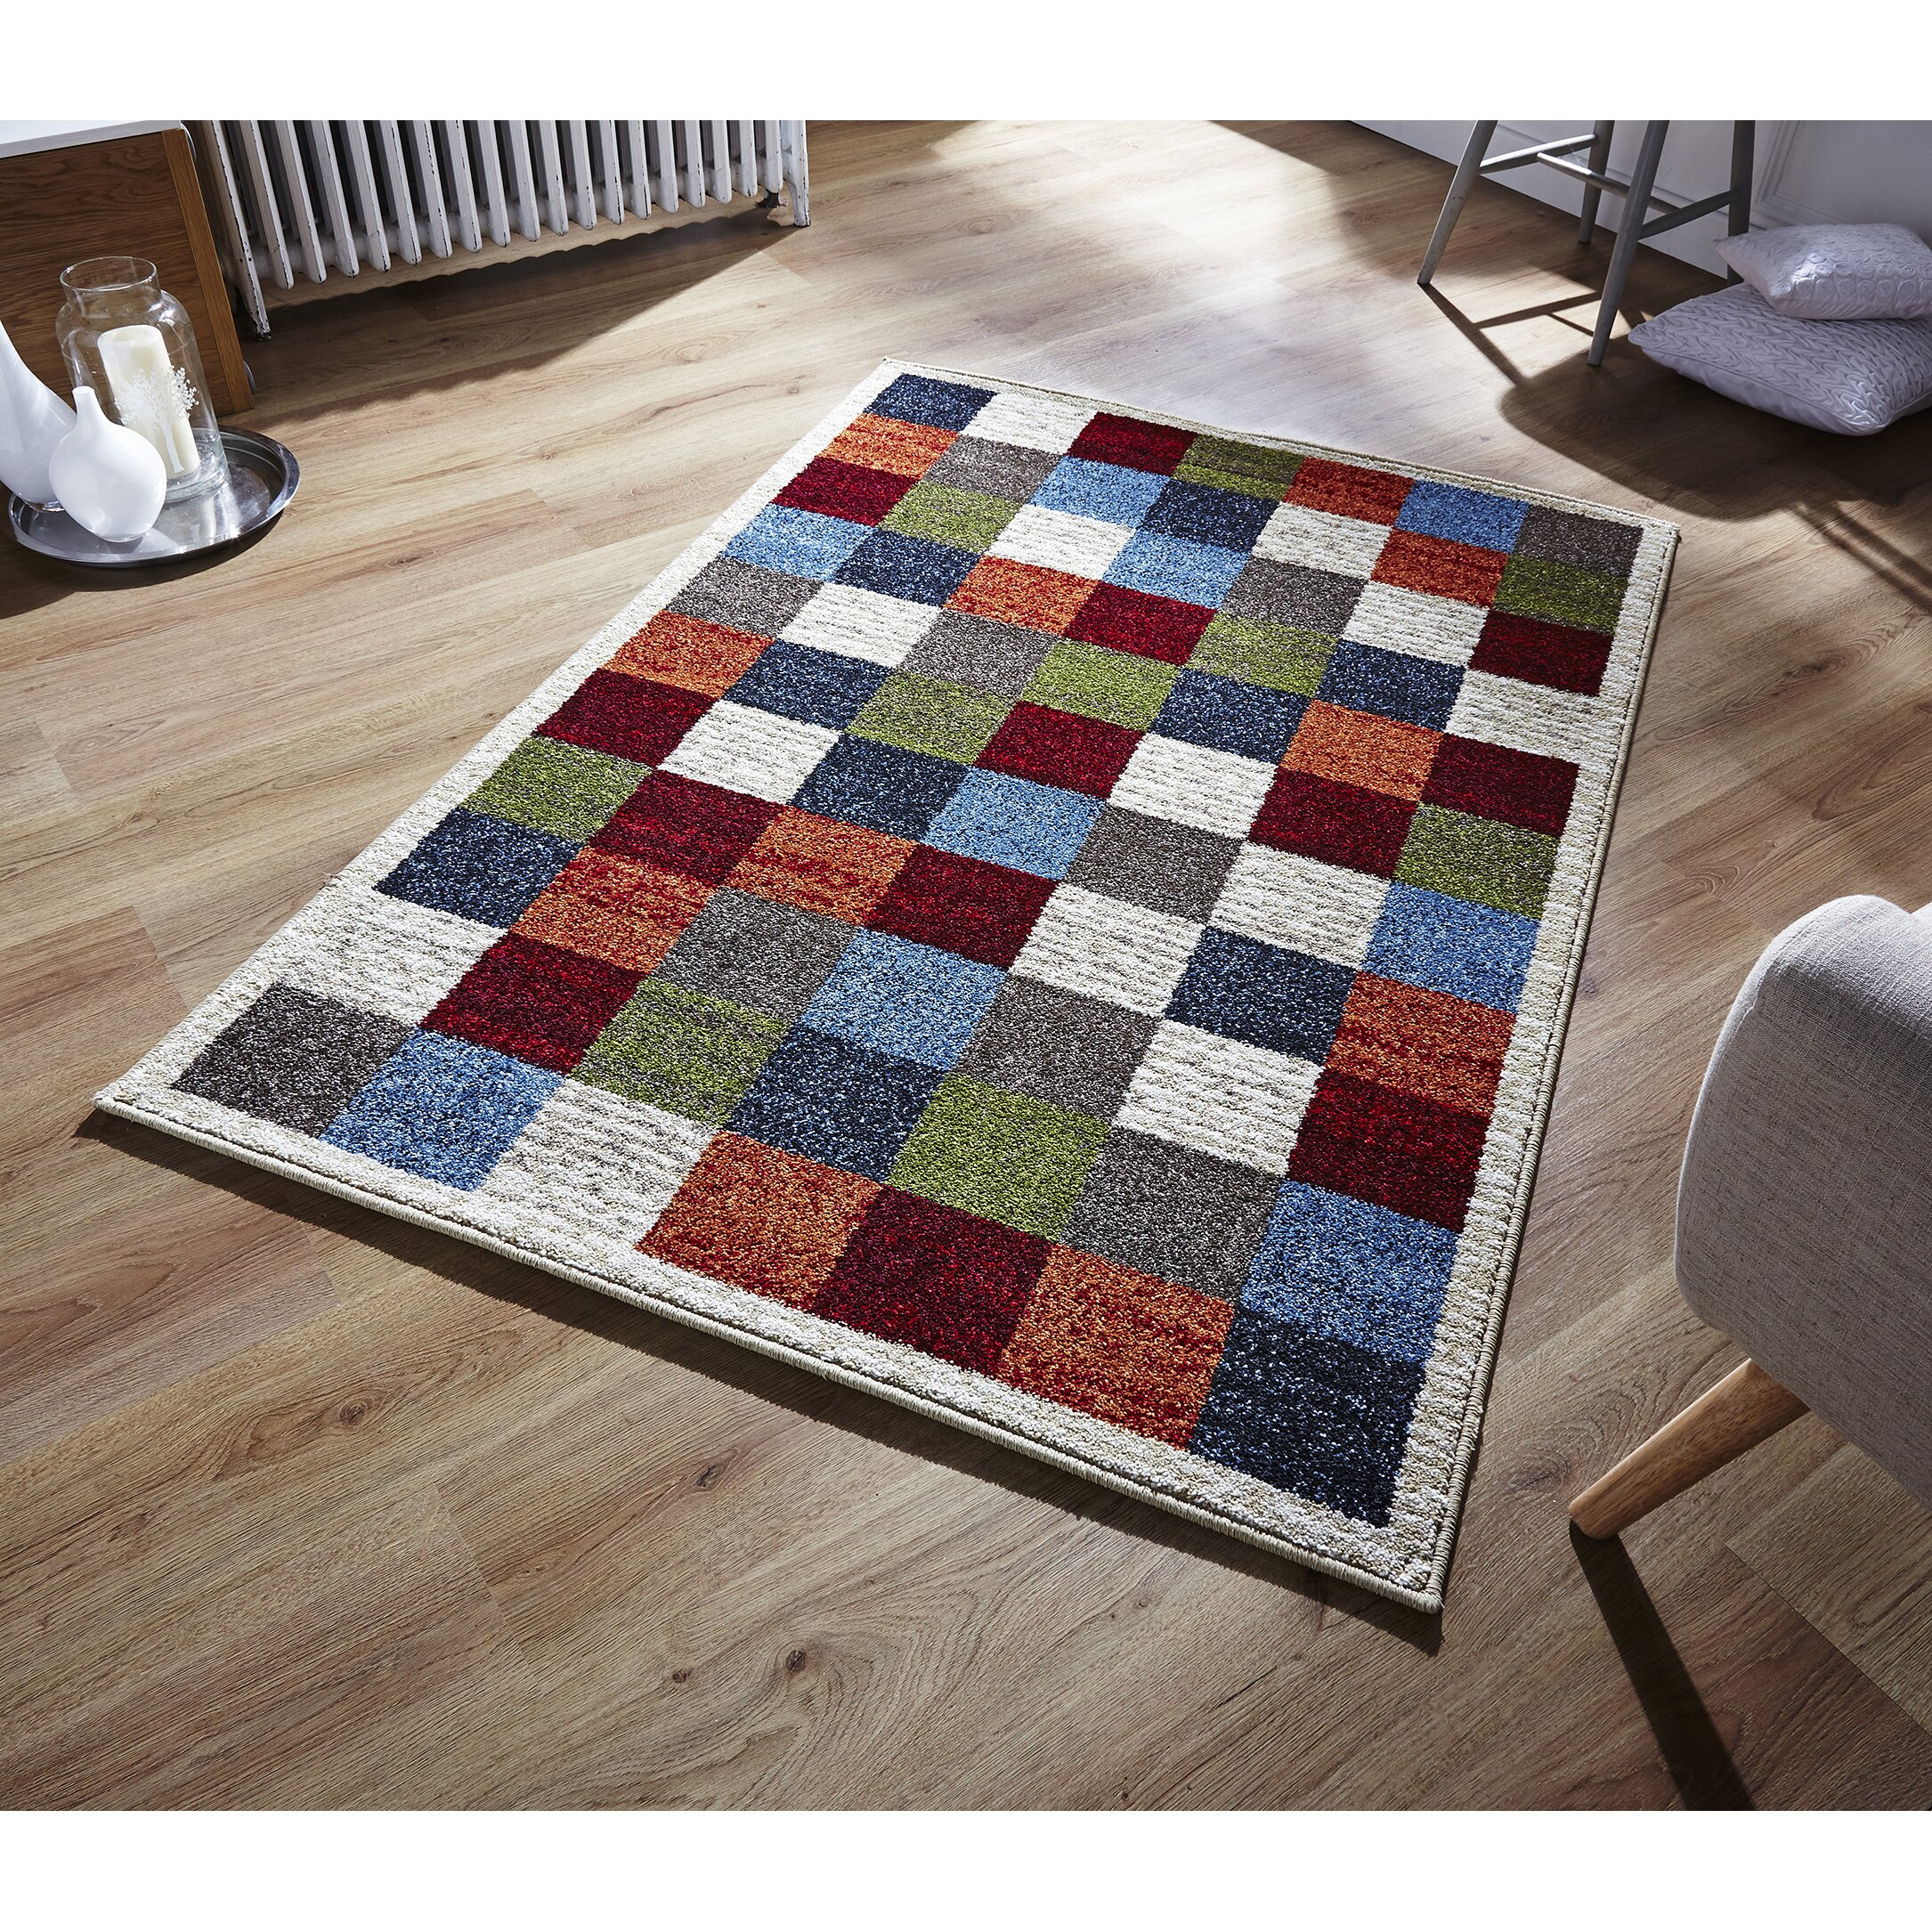 brook lane rugs zante grey red area rug reviews wayfair uk. Black Bedroom Furniture Sets. Home Design Ideas